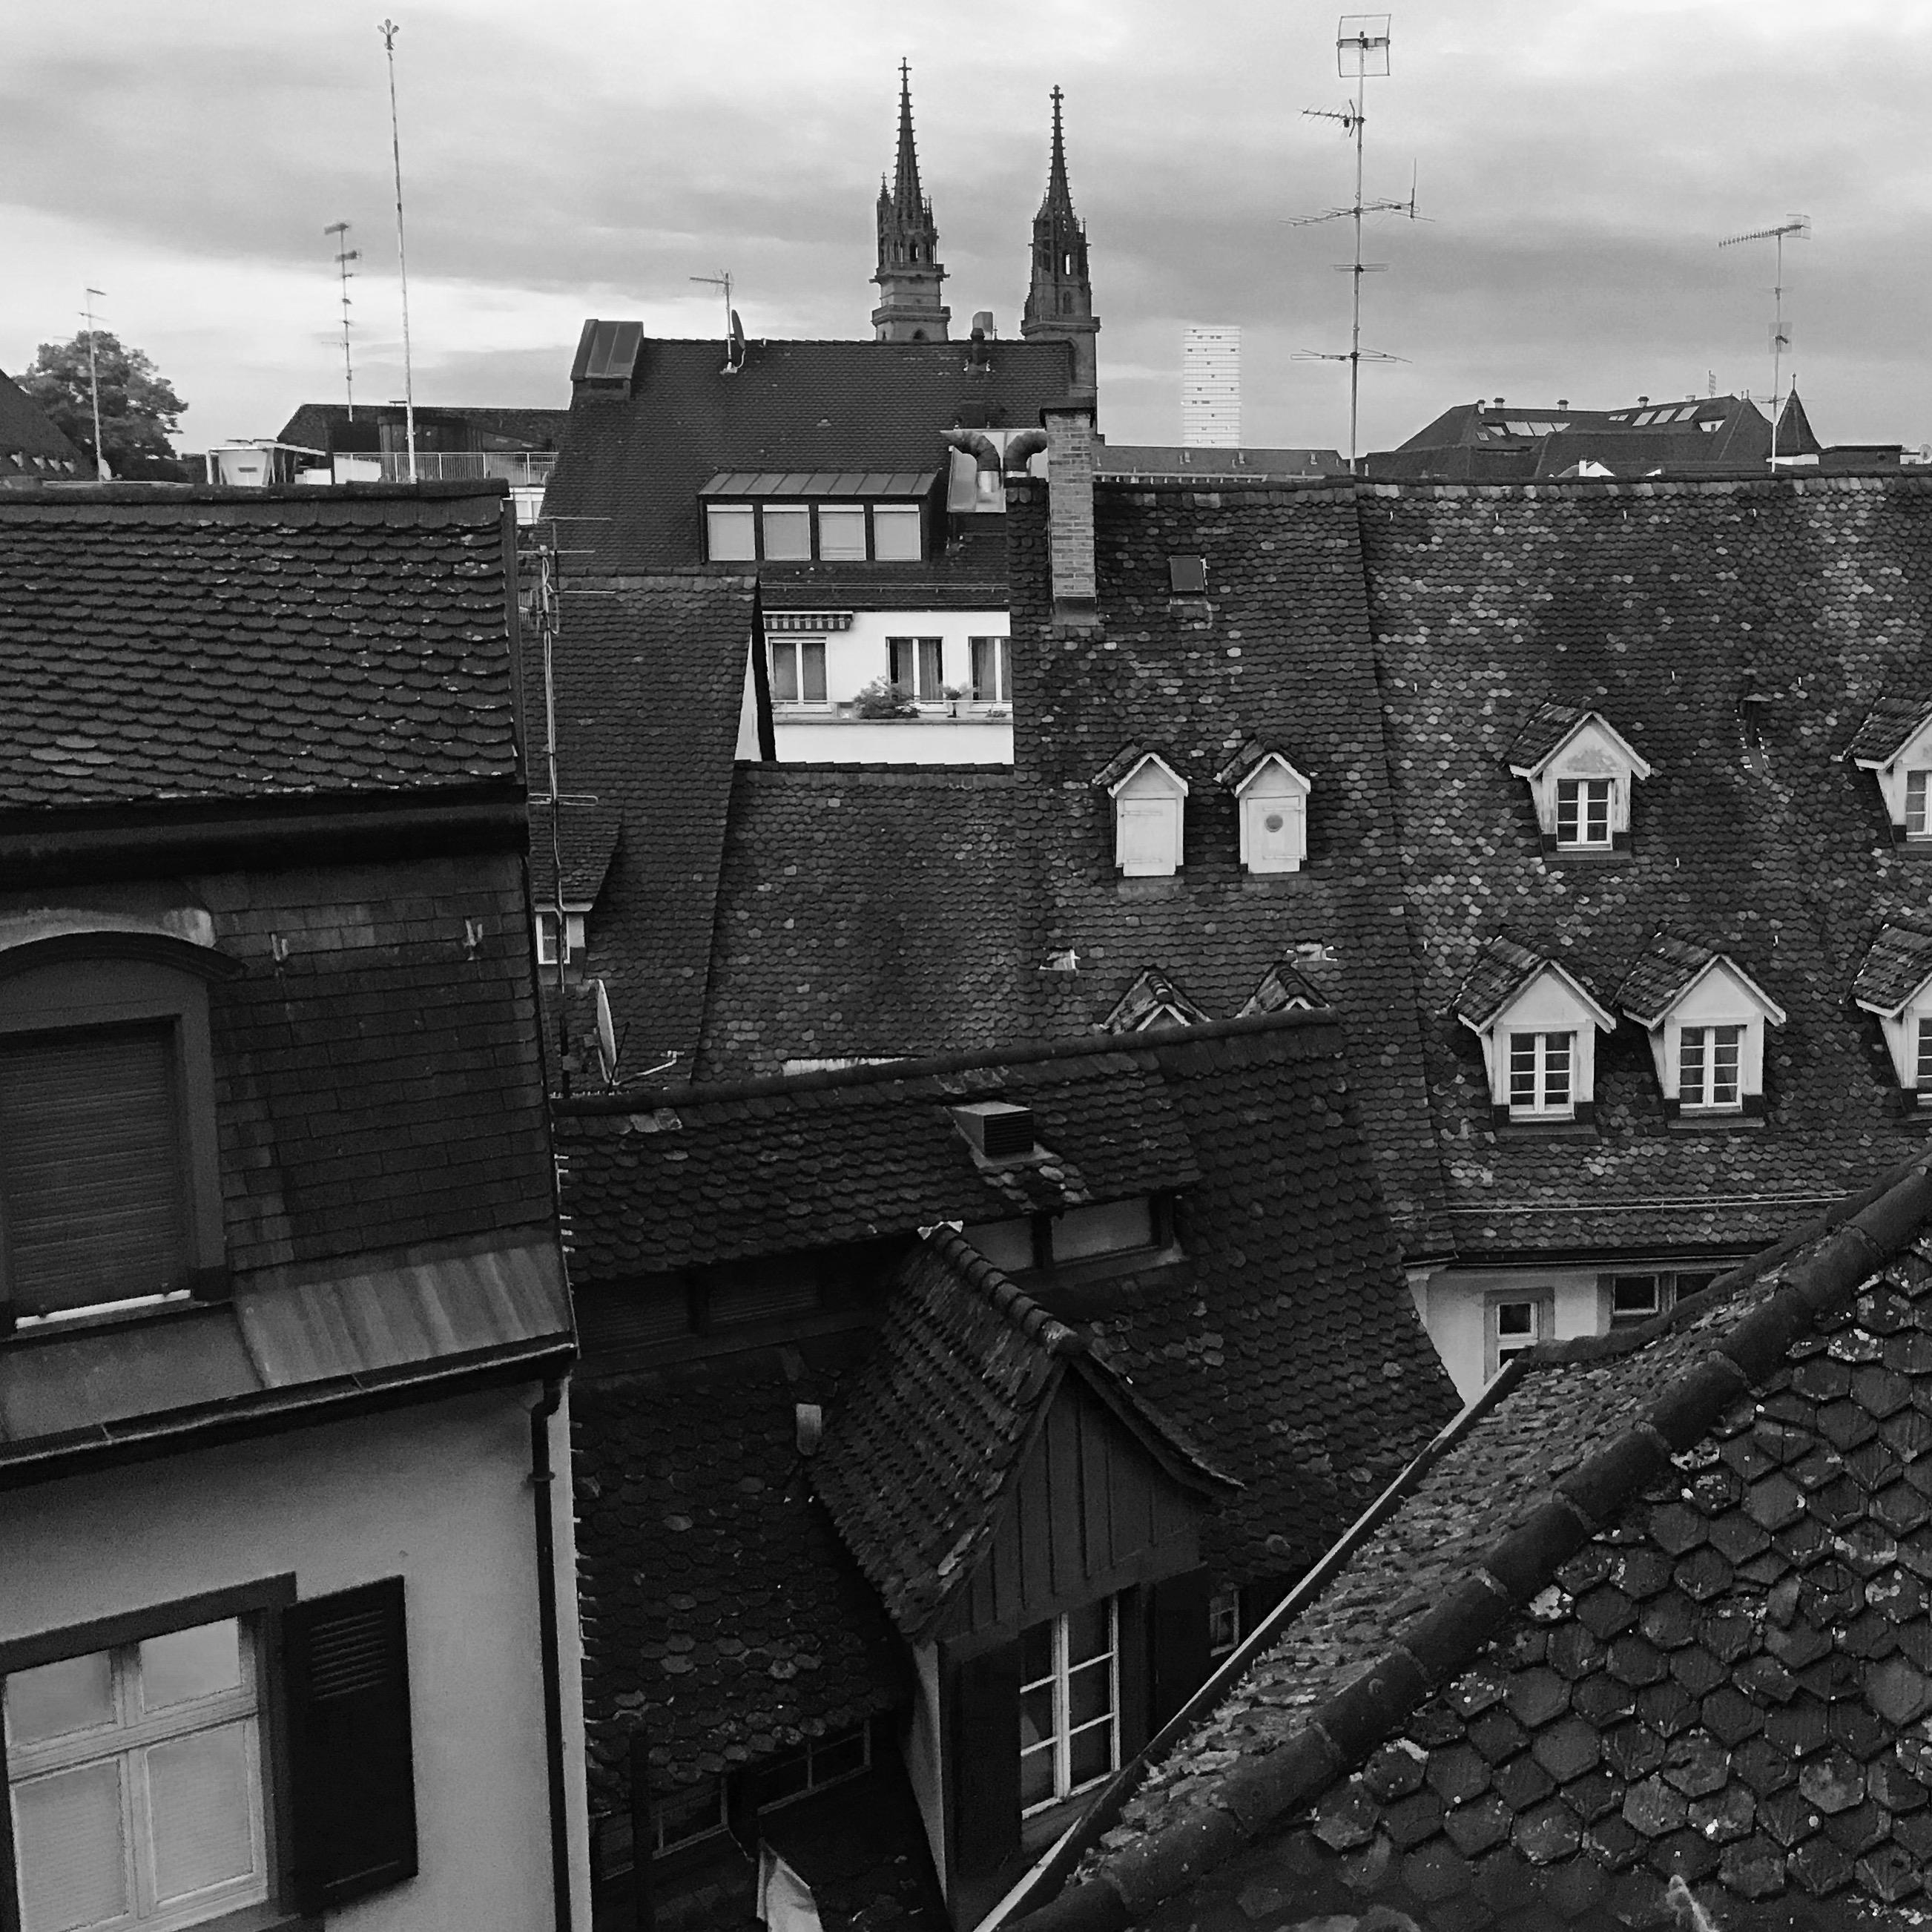 132. 12 MAY 2018-Basel- Rooftops and win